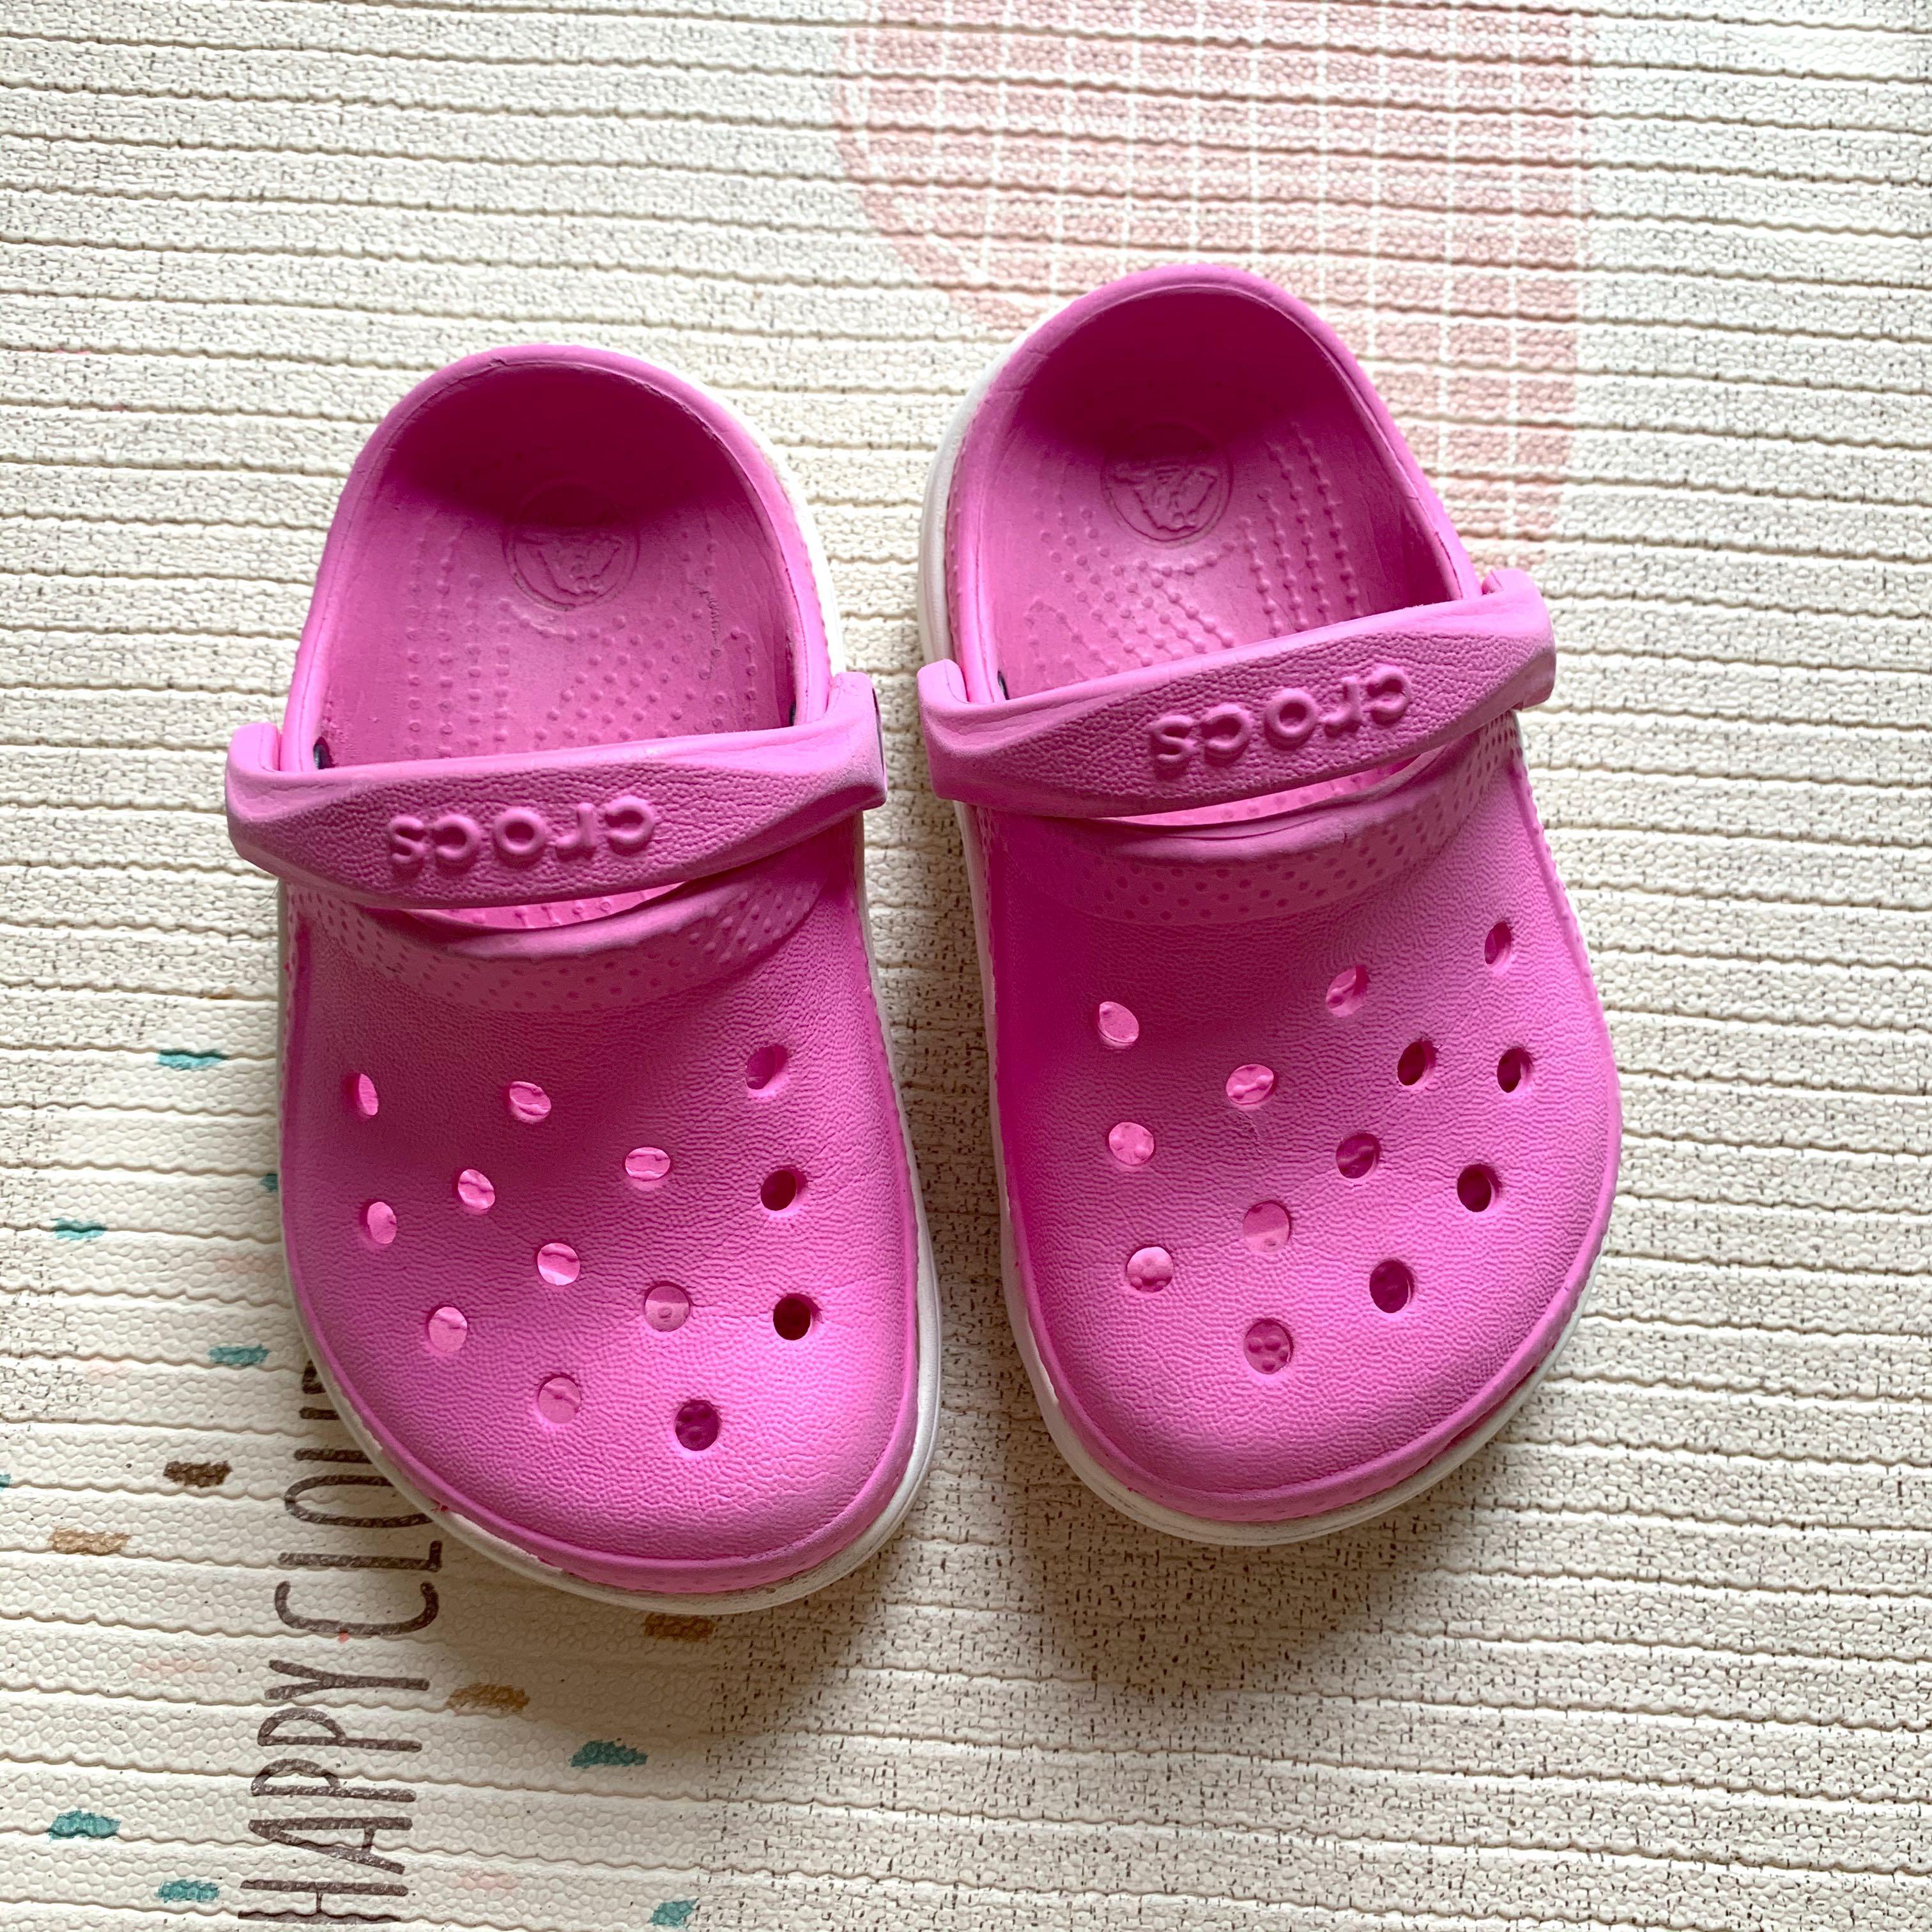 Crocs clogs for girls size 6/7, Babies